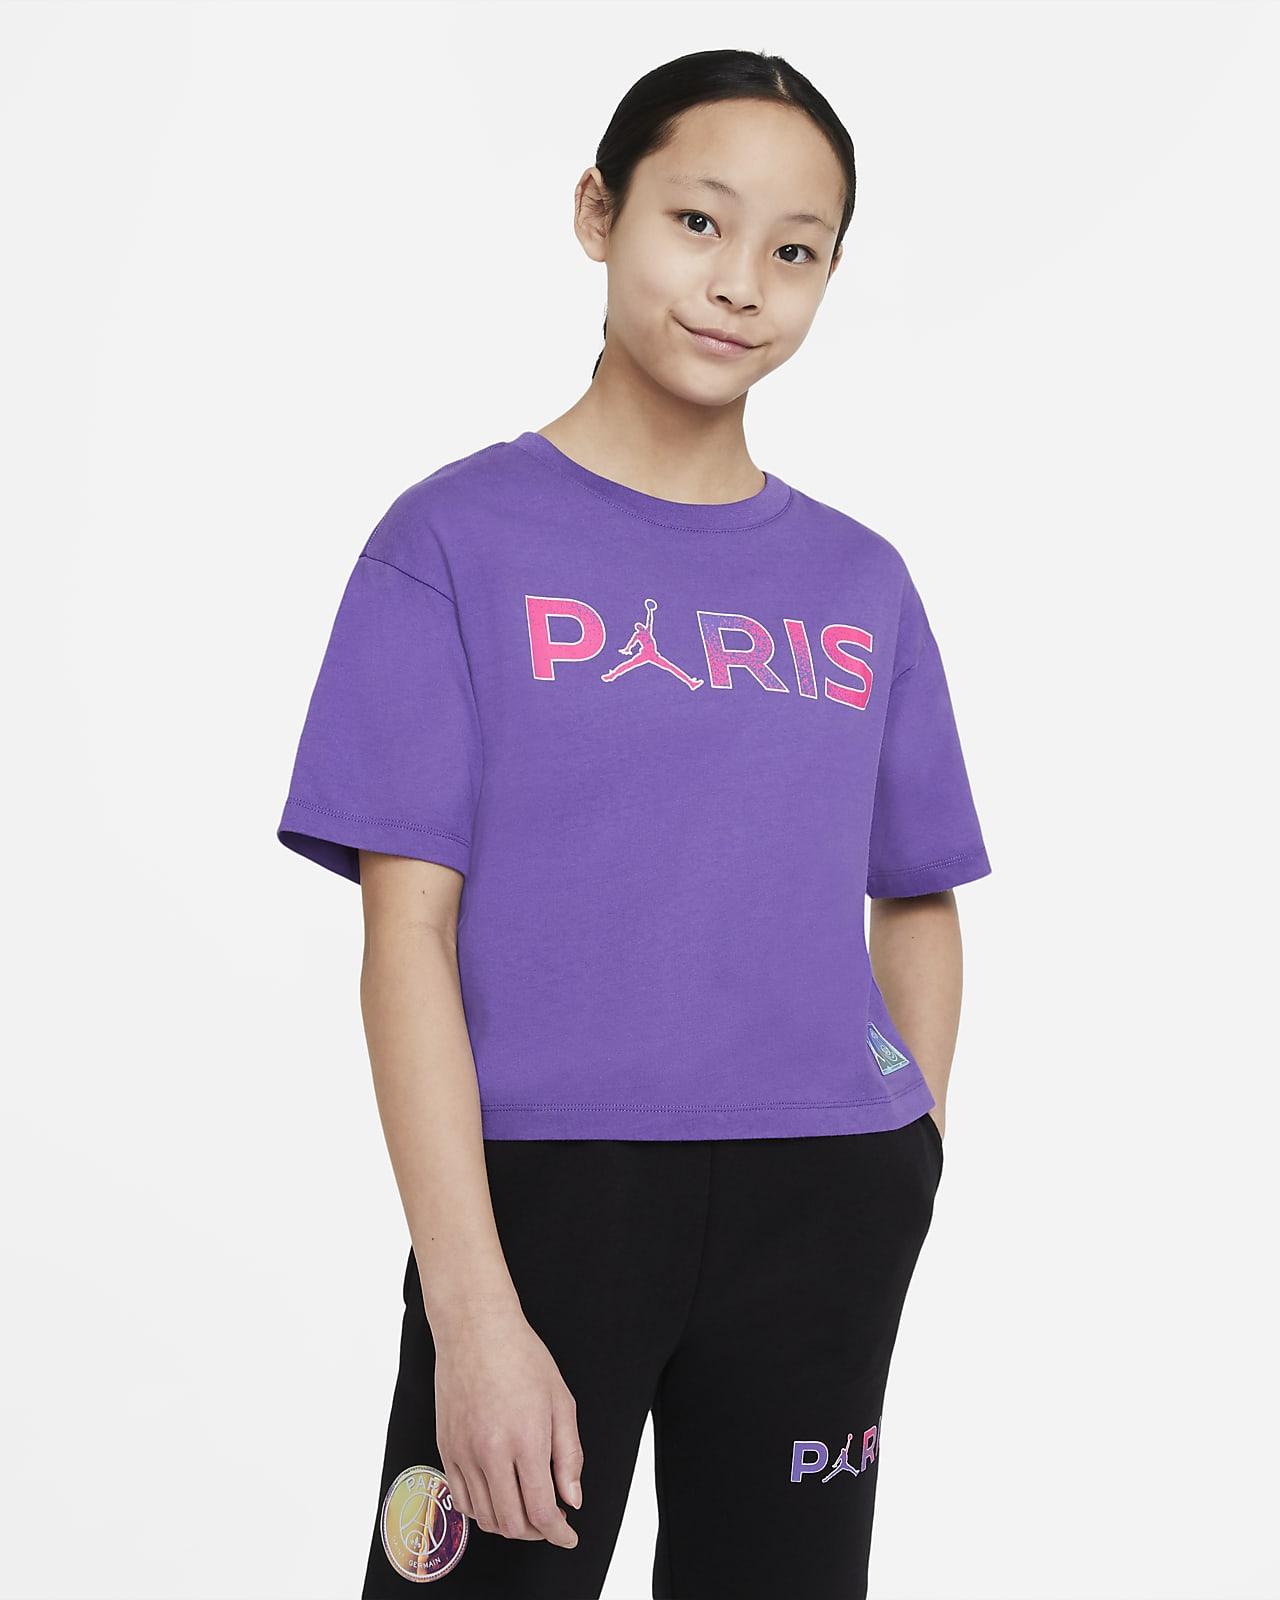 Paris Saint-Germain Older Kids' (Girls') T-Shirt